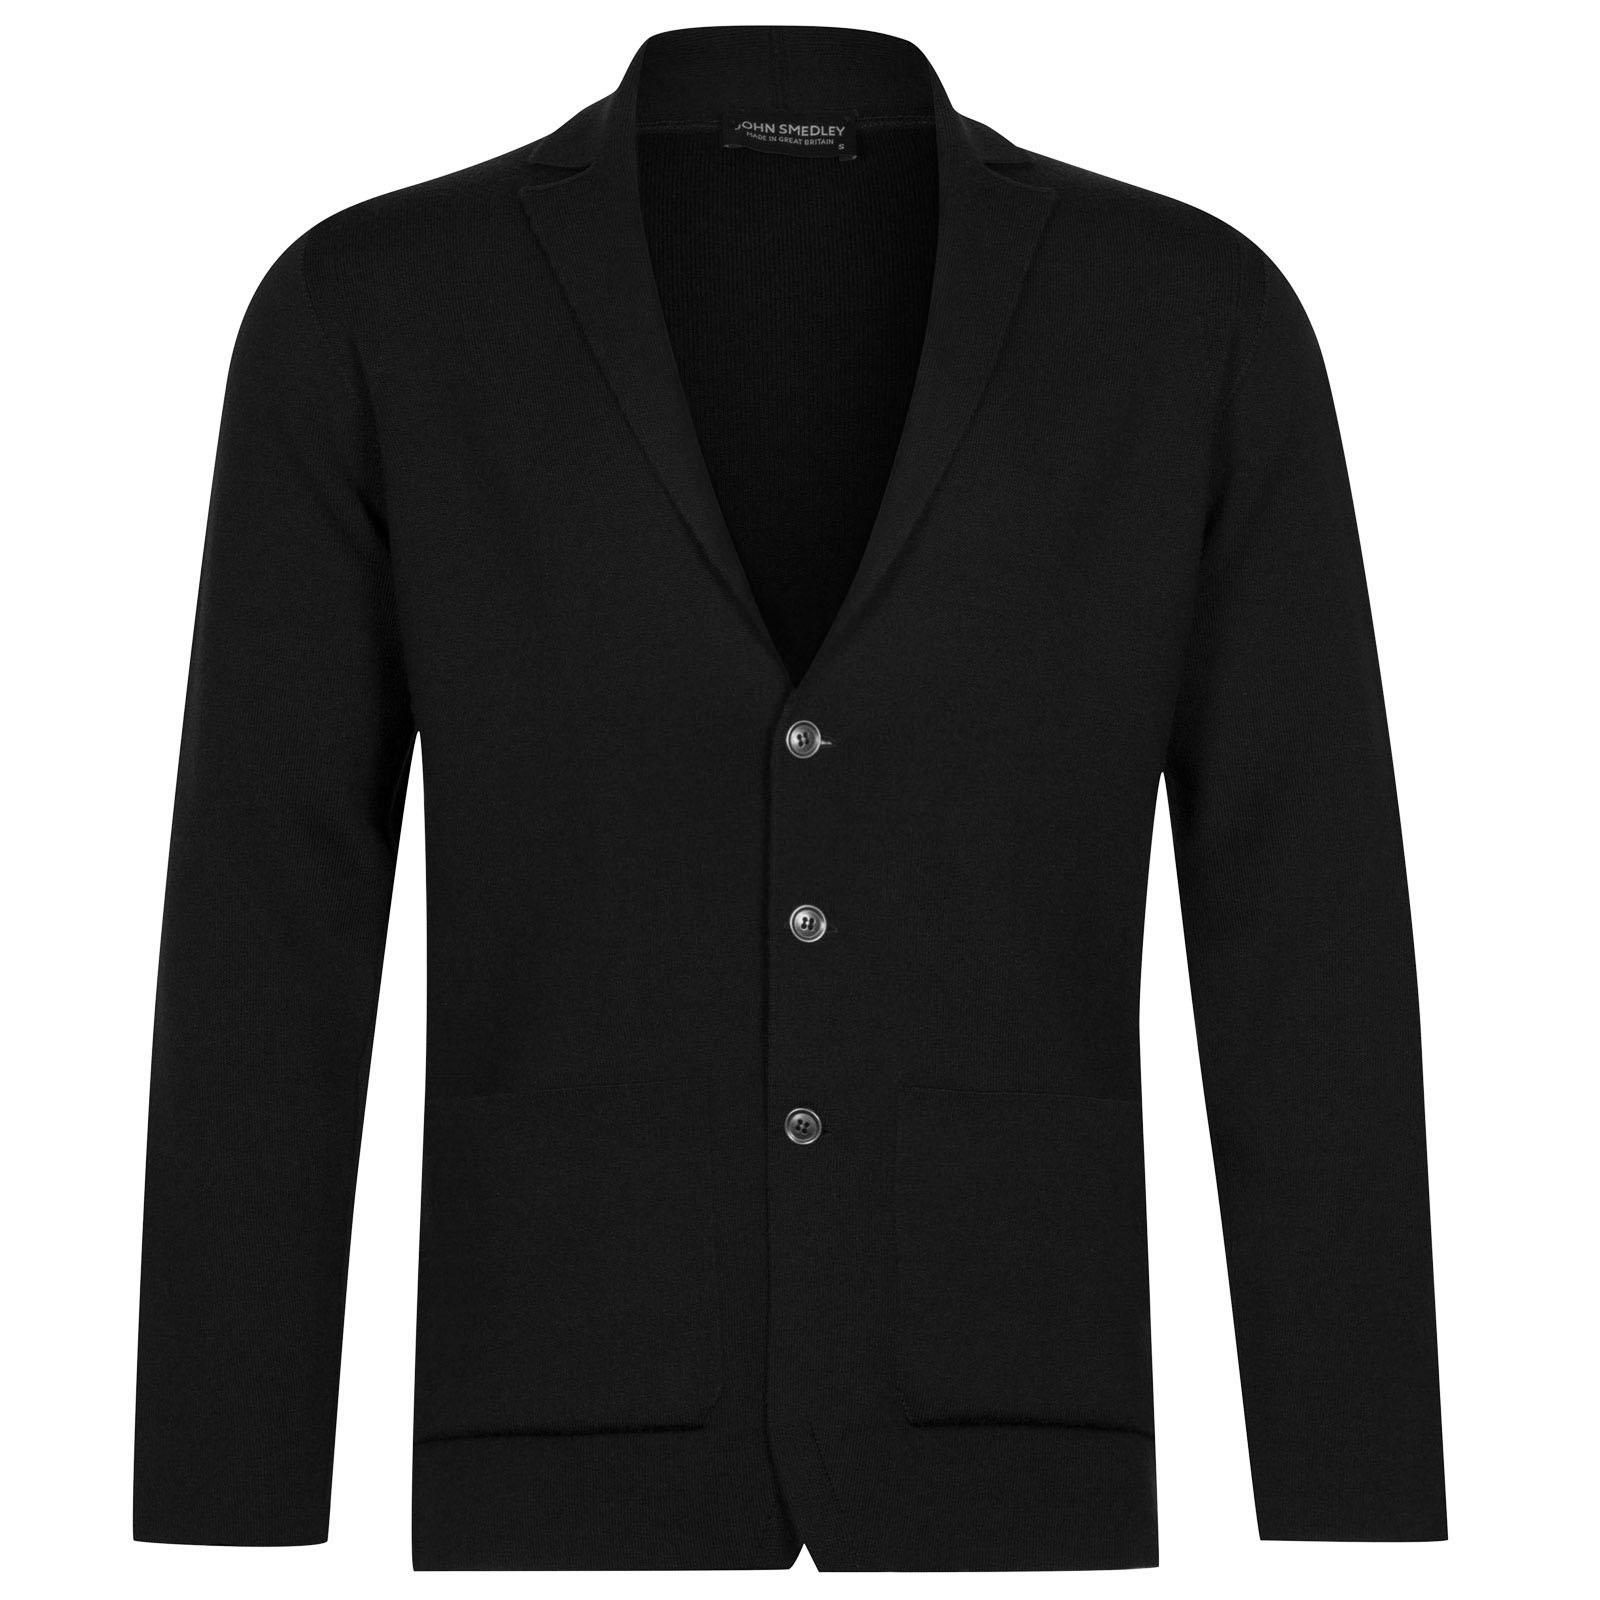 John Smedley Oxland Merino Wool Jacket in Black-XL